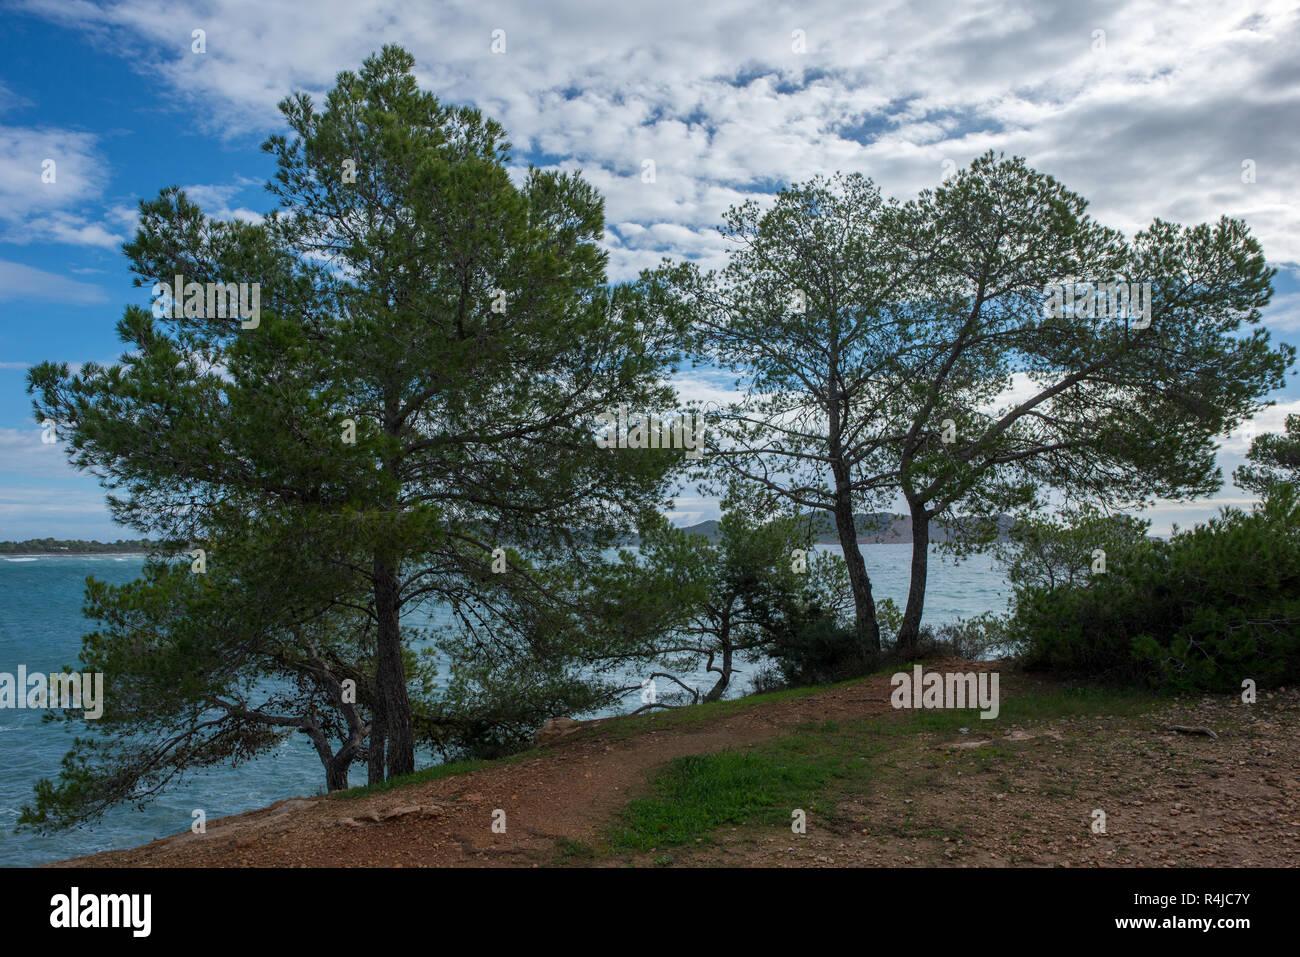 Tree next to the coast of Cala Sa caleta, Ibiza, Spain - Stock Image